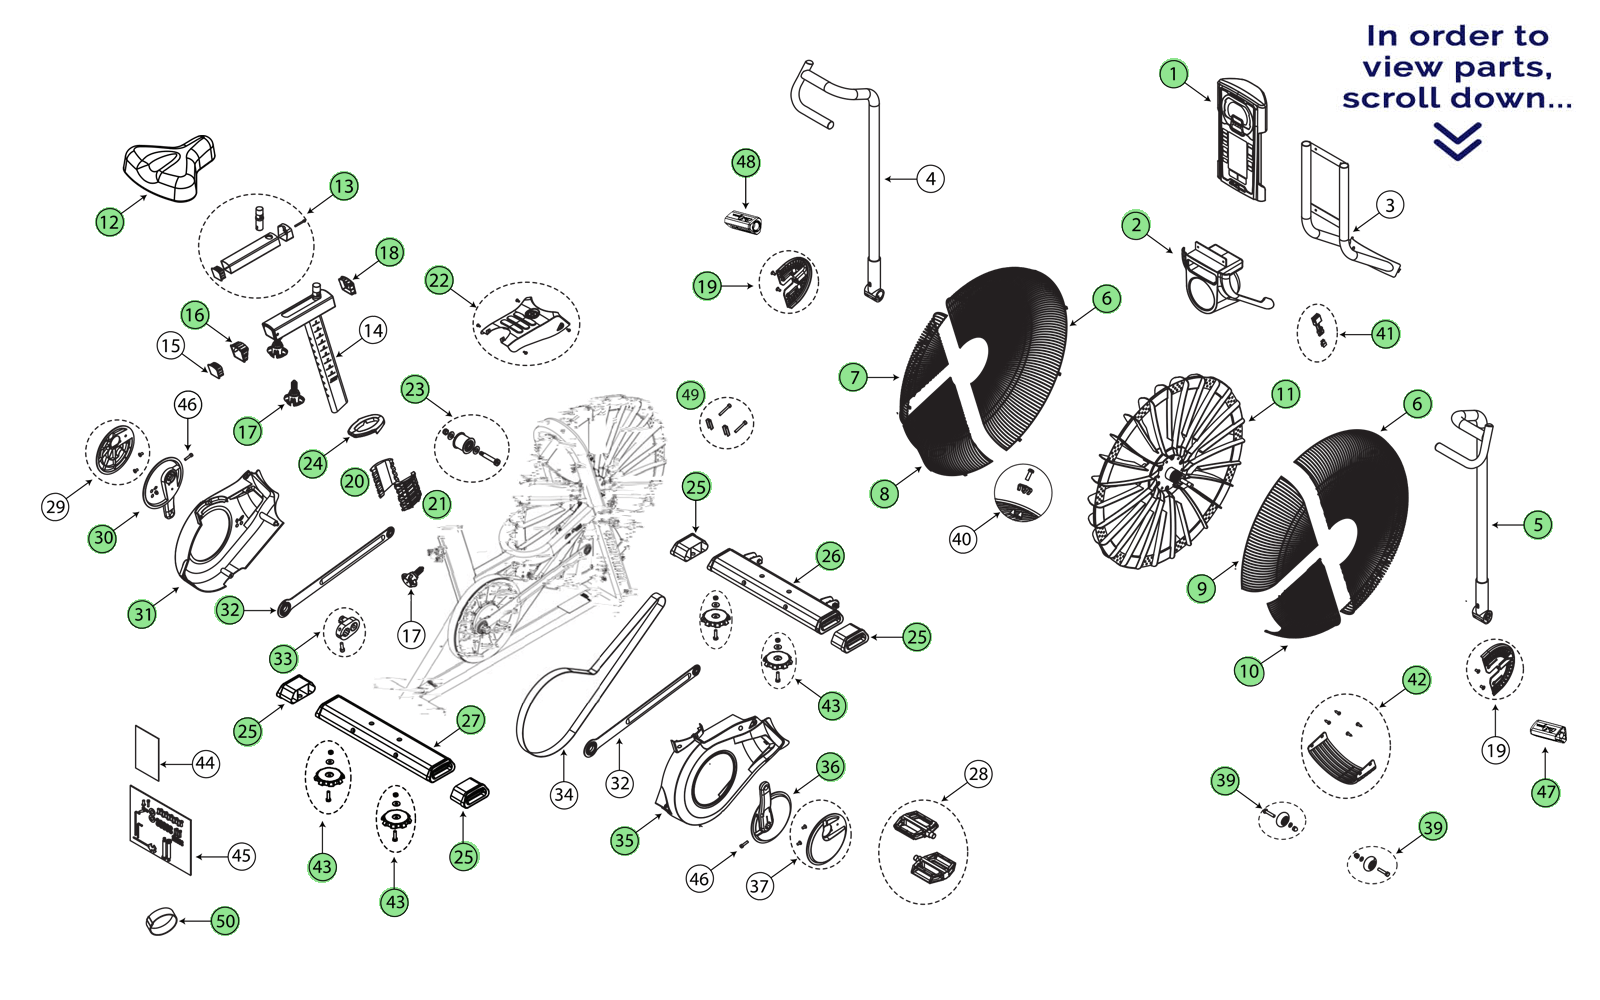 Schwinn Airdyne Exercise Bike Parts Manual